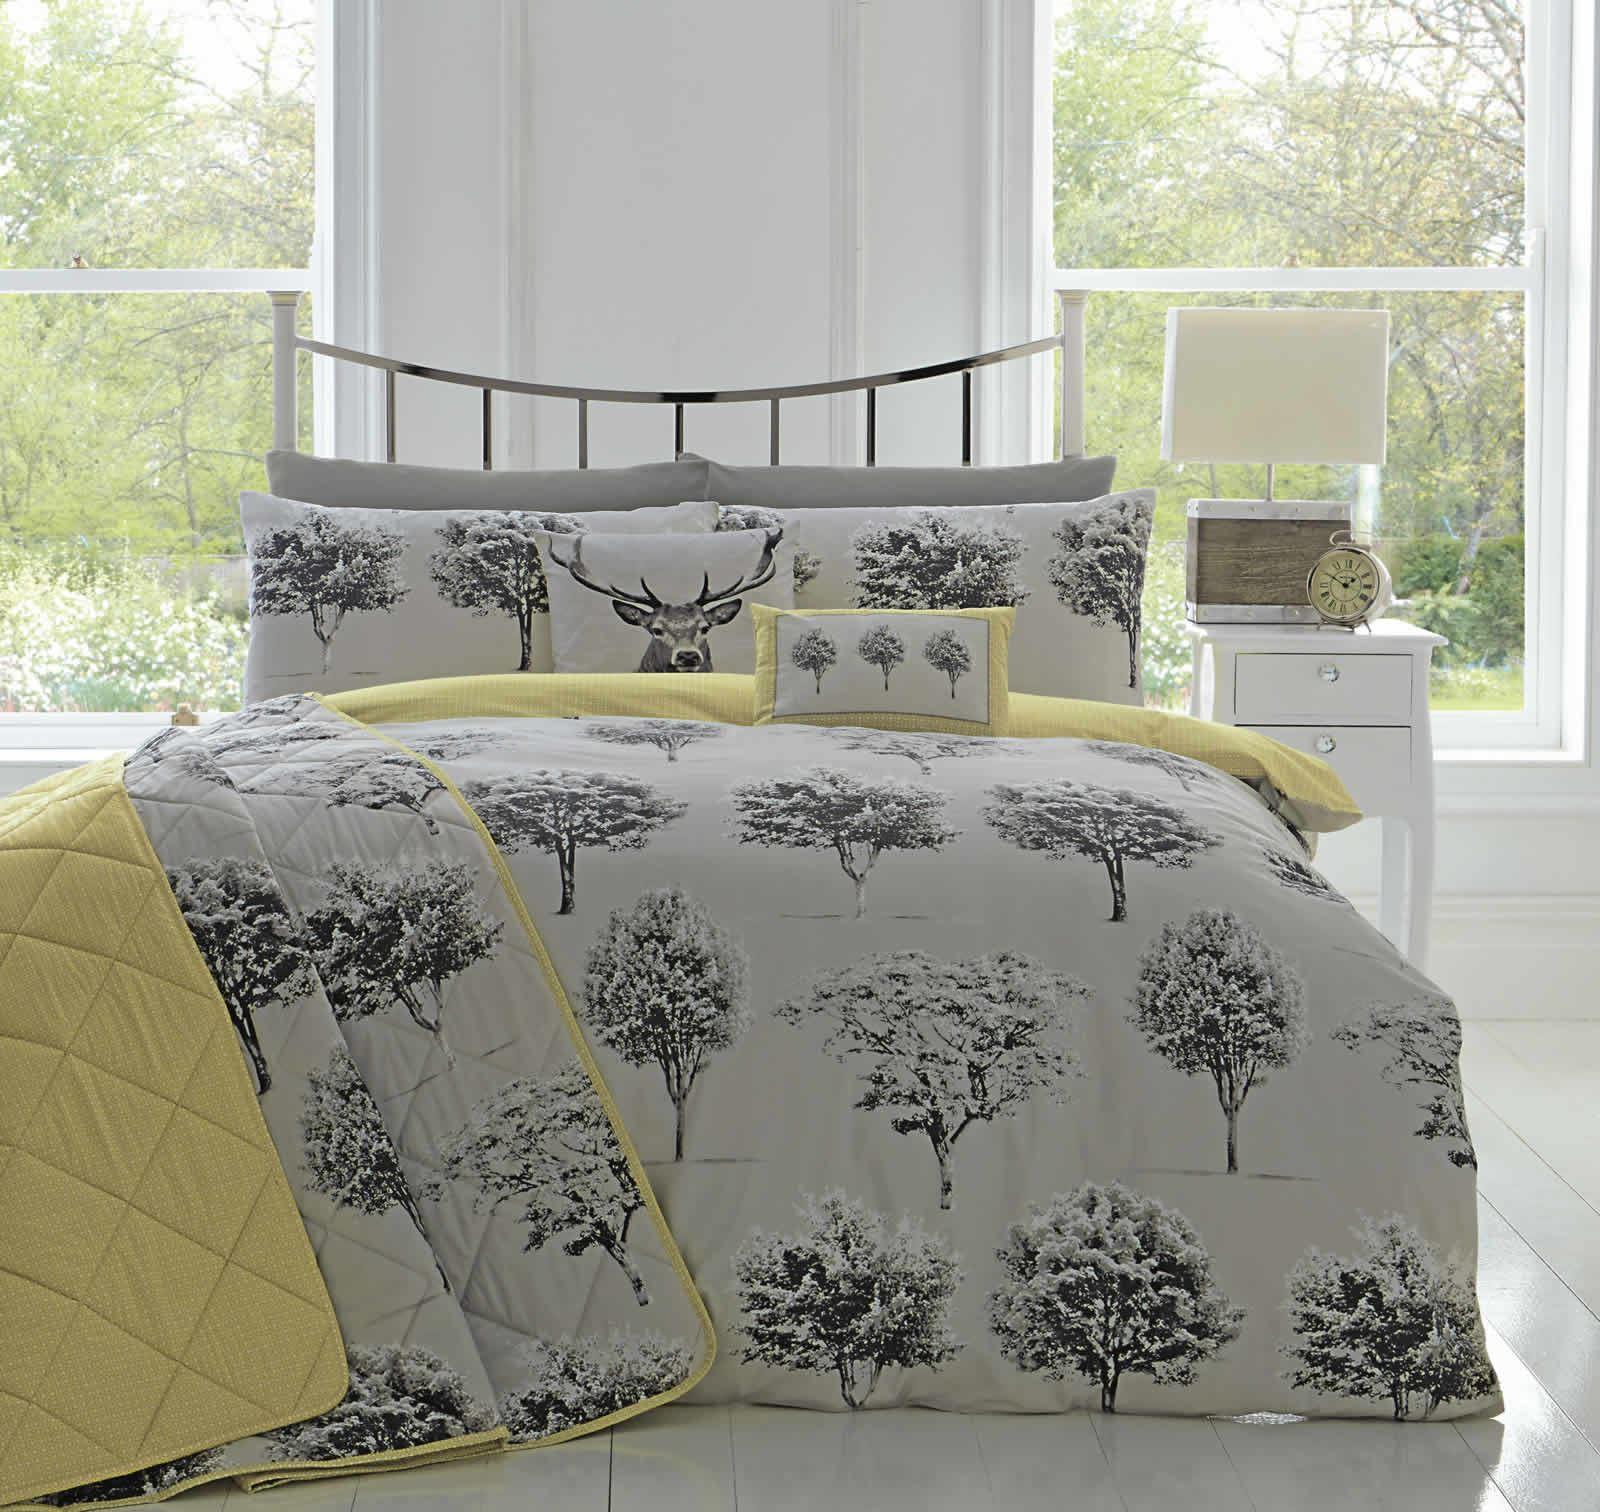 appletree® woodlands reversible duvet covers quilt set rothay grey  - appletreewoodlandsreversibleduvetcoversquiltsetrothay